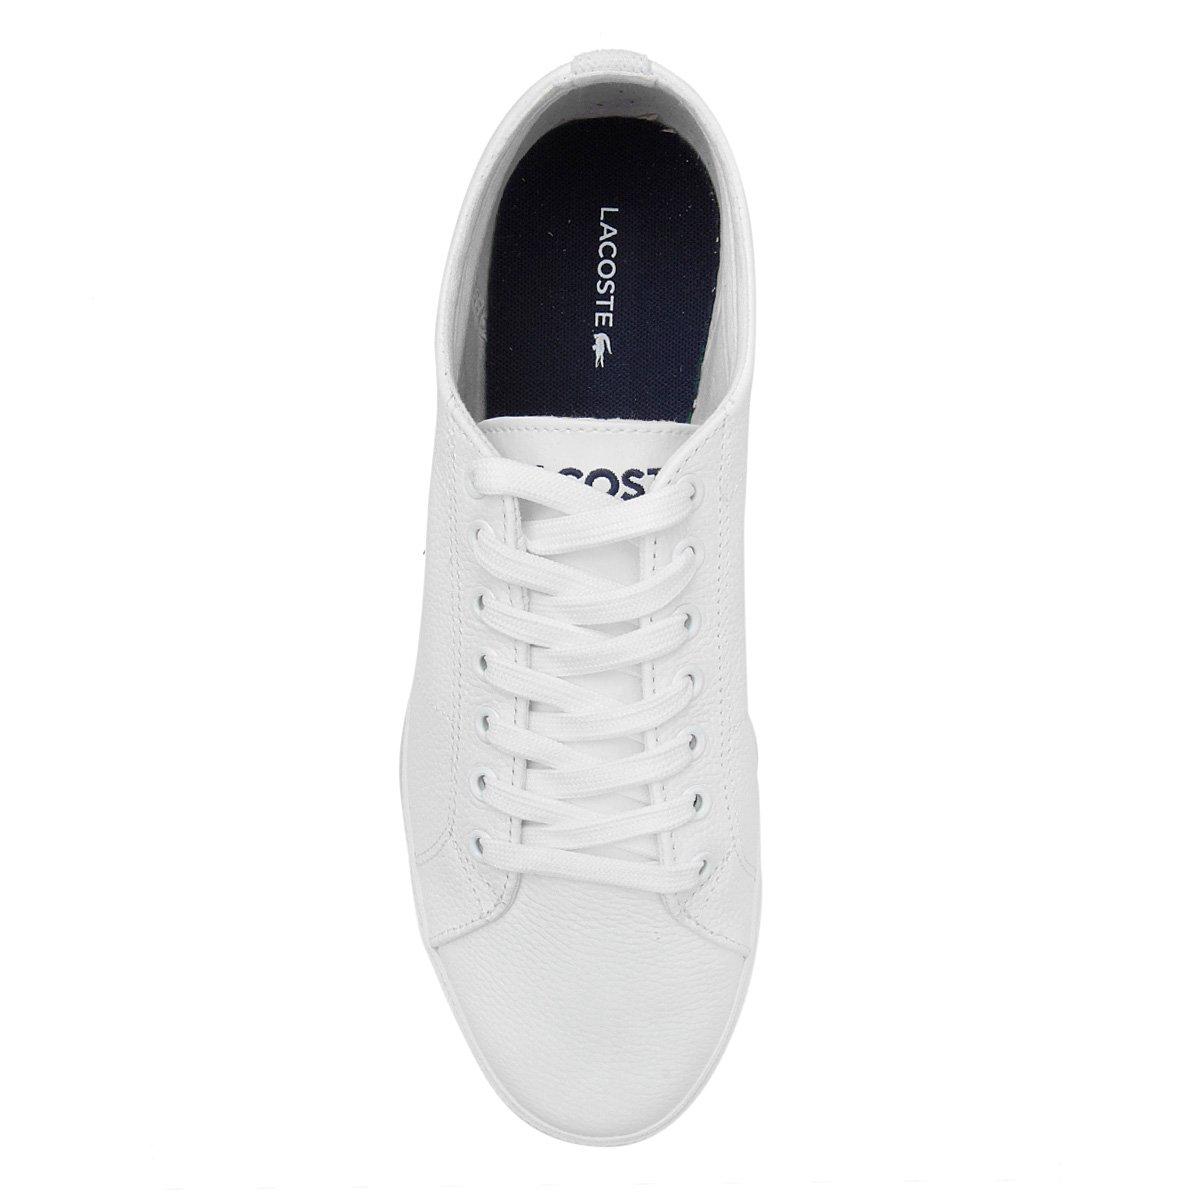 Tênis Lacoste Marcel Masculino - Branco - Compre Agora   Netshoes 216d085639